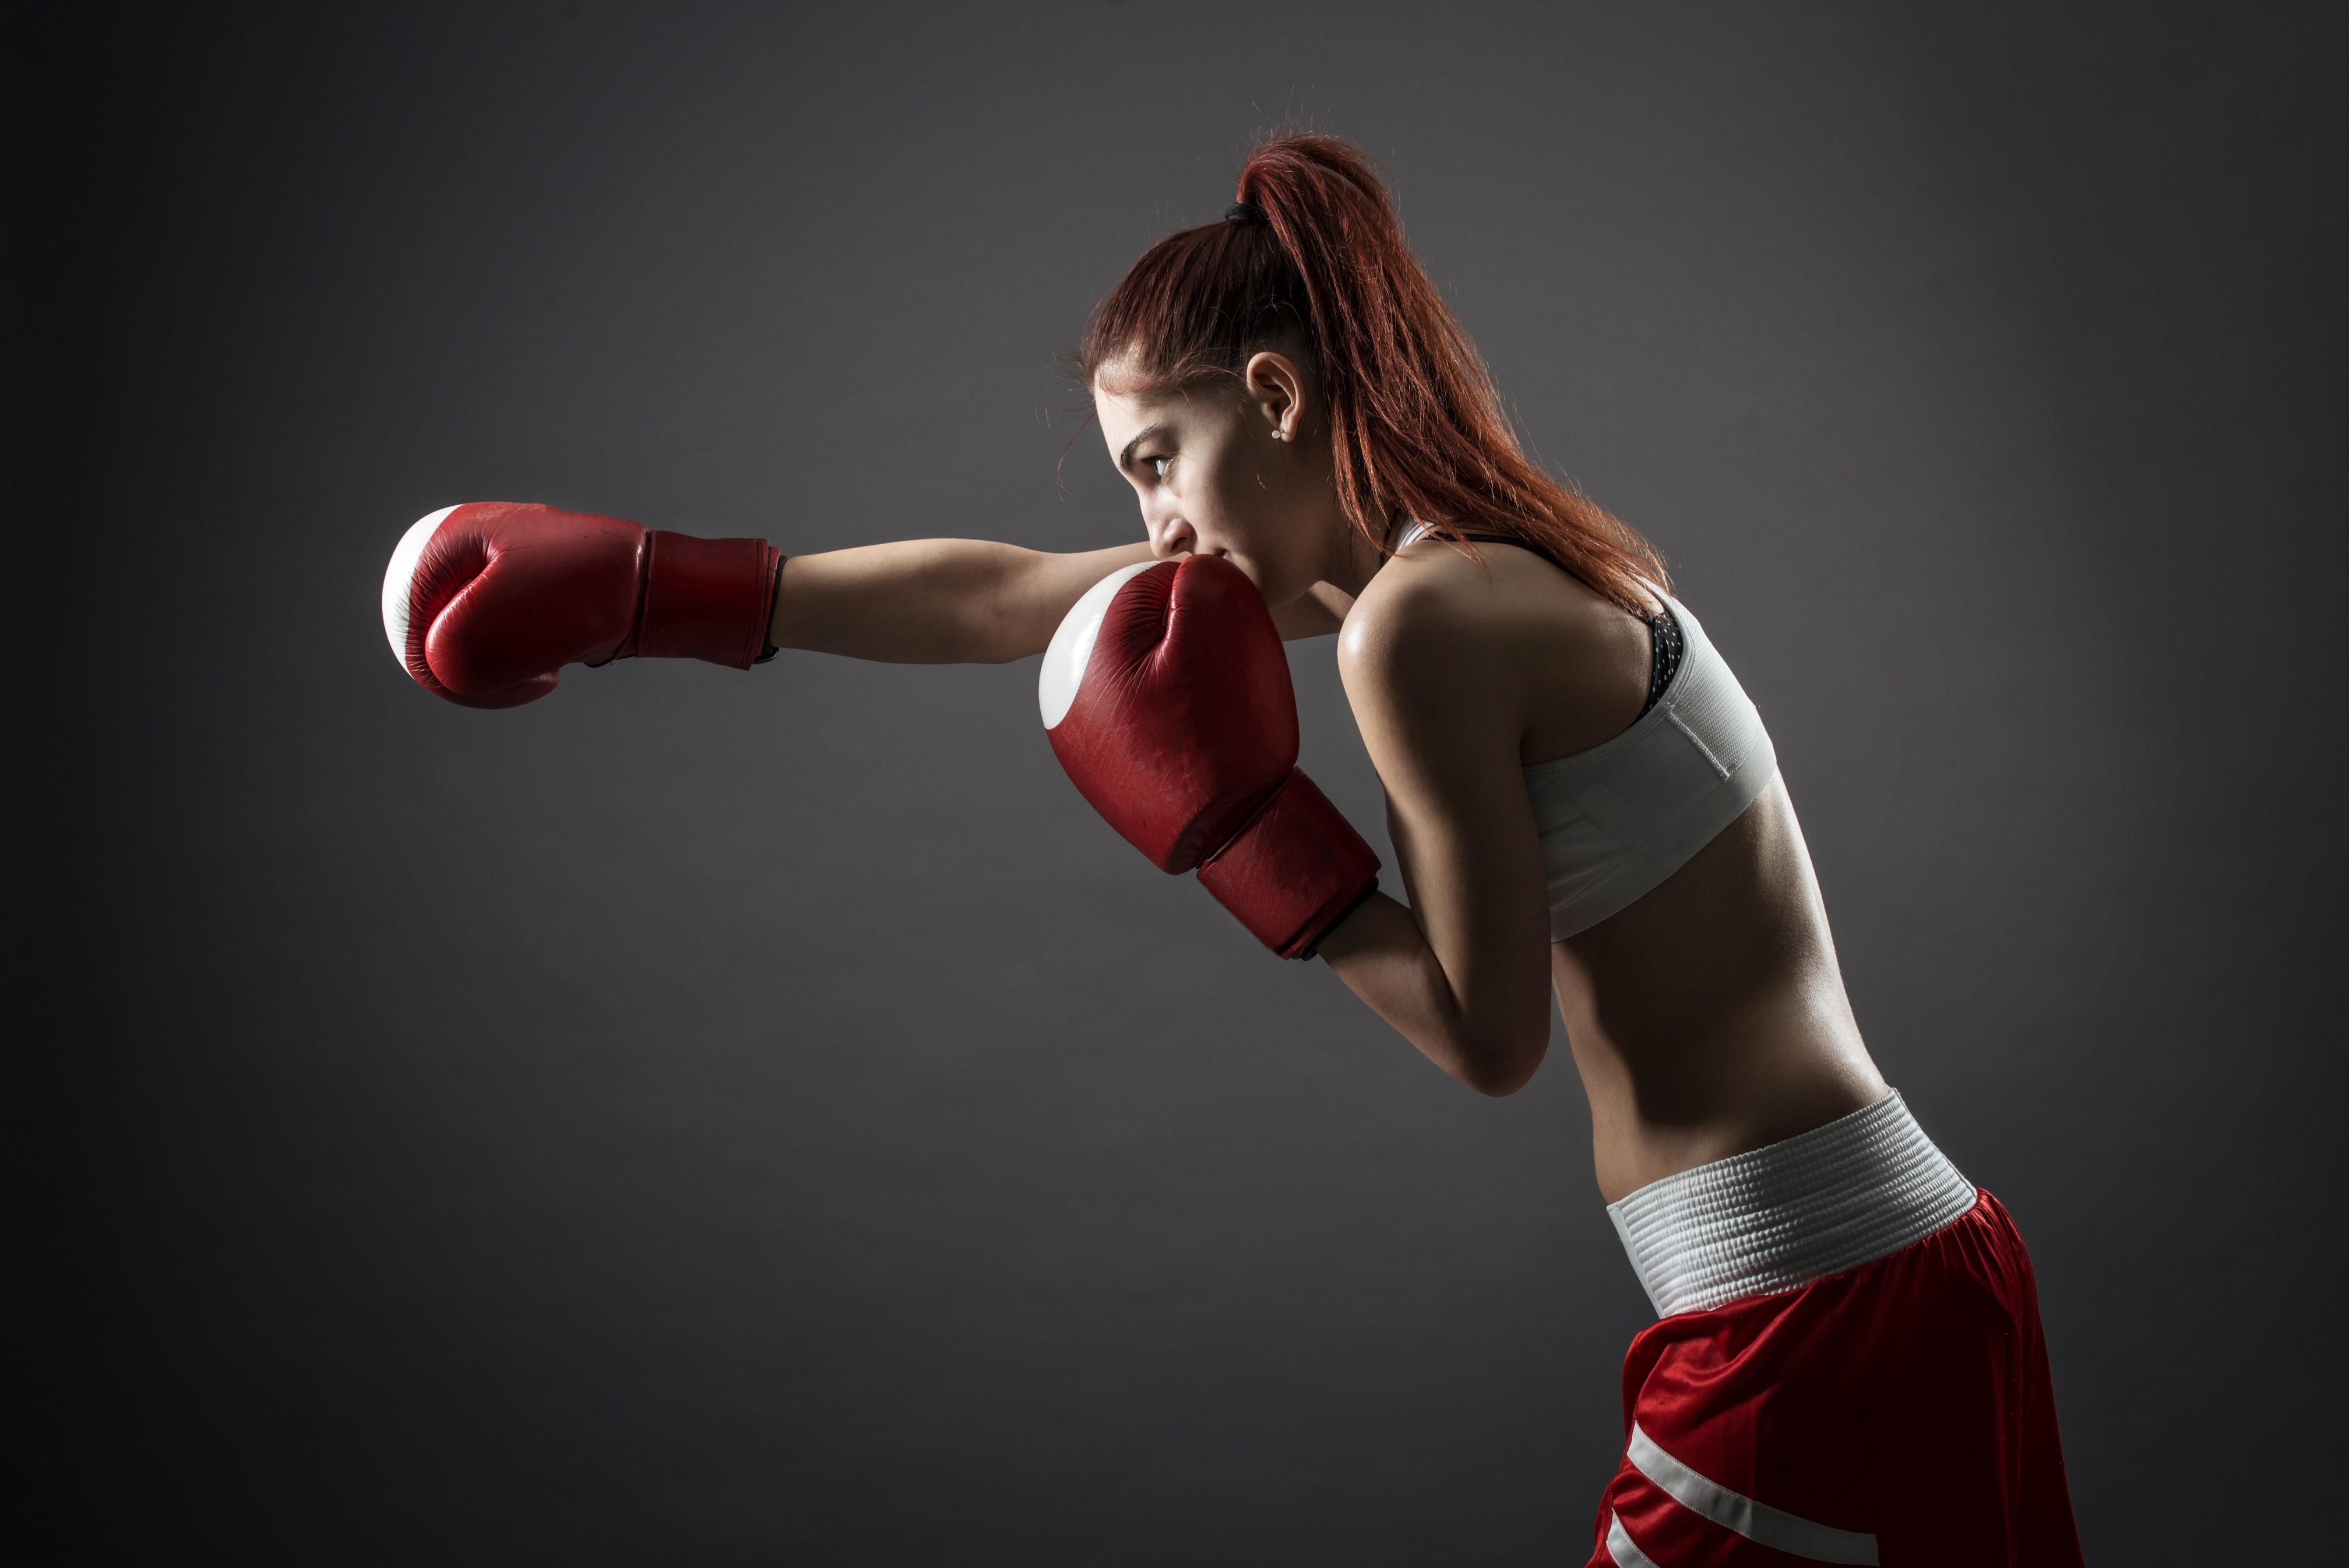 Download 4031x2691 boxing, women, boxing gloves, redhead, sport, box ...